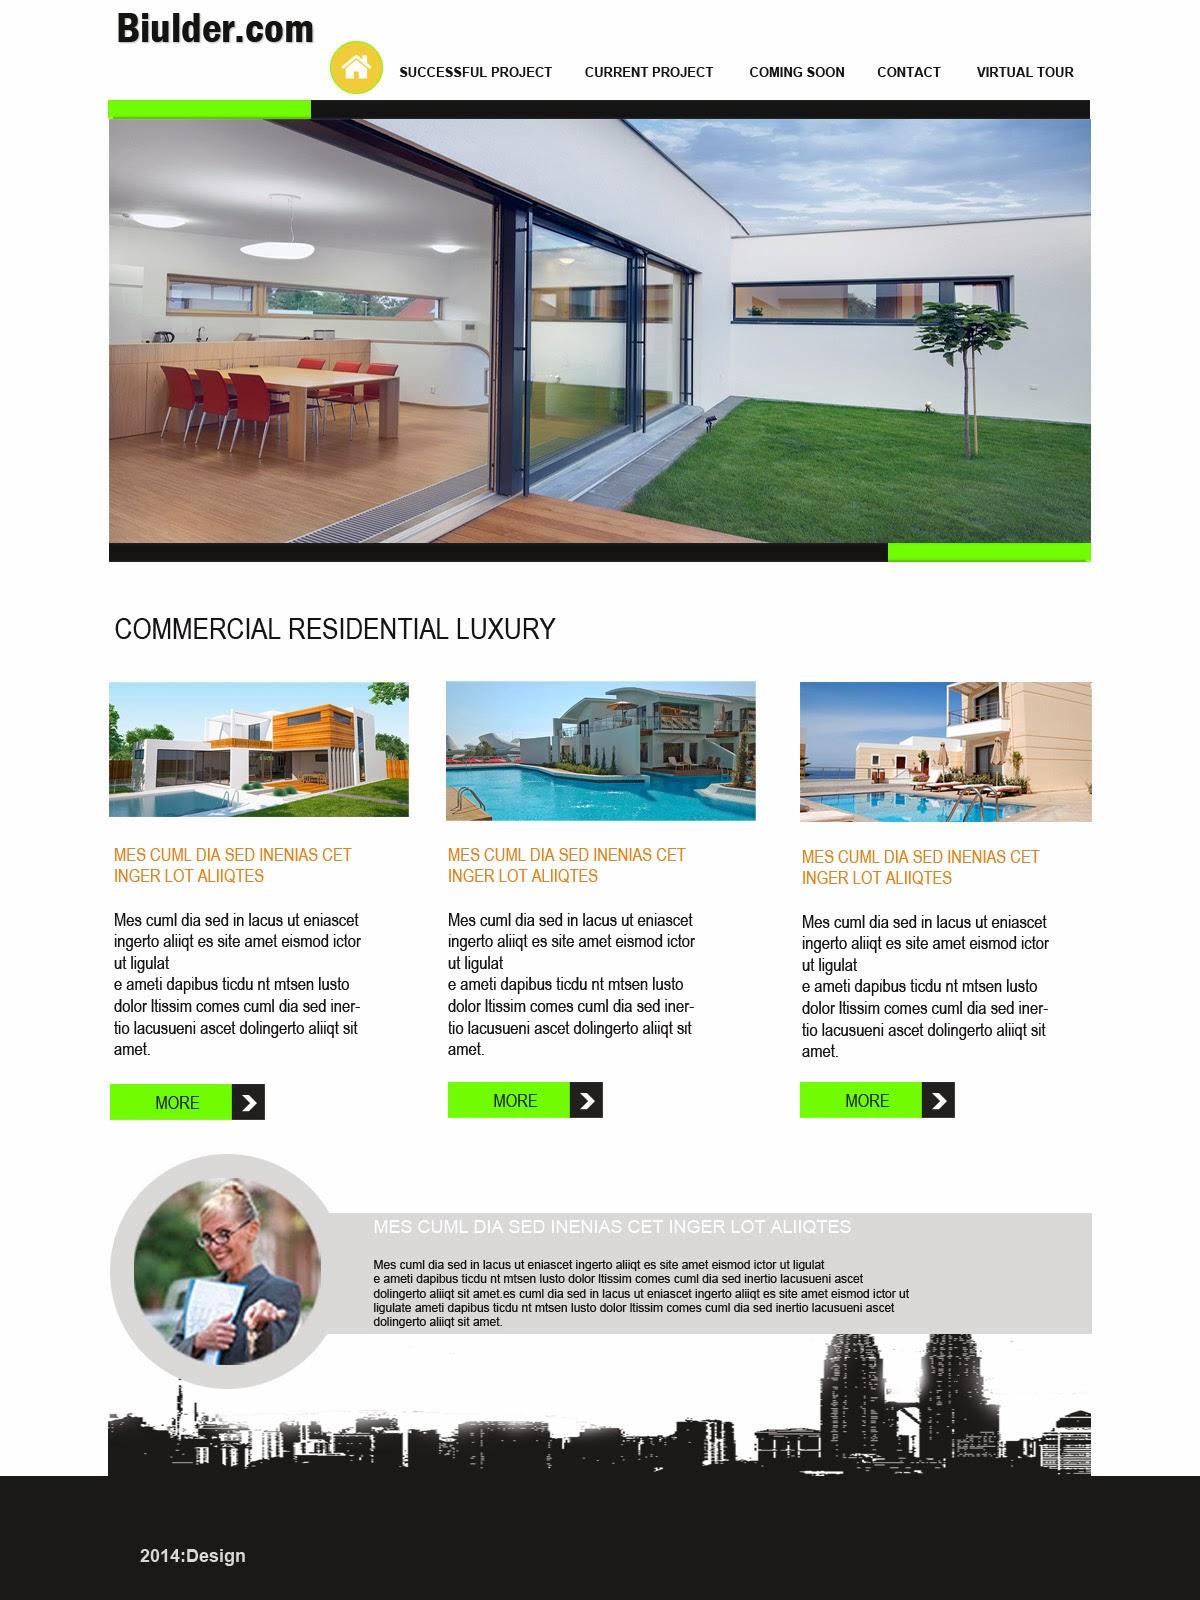 best design of website, SEO website services, it software company in inodre, Mahakal web technologies